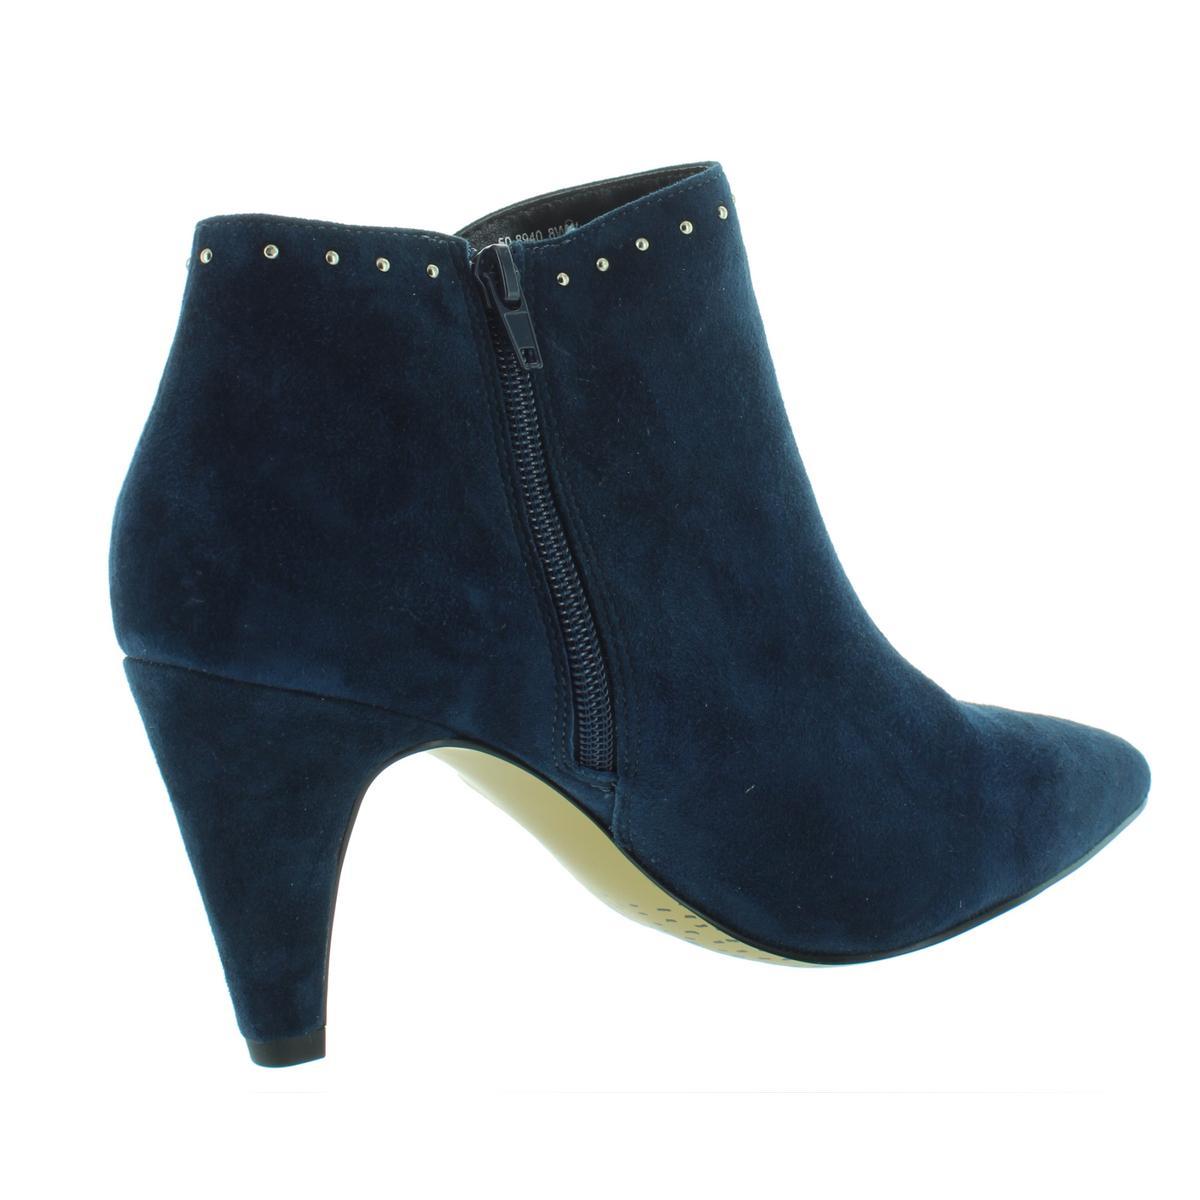 Bella Vita Damenschuhe Delfina Studded Suede BHFO Almond Toe Booties Schuhes BHFO Suede 0827 2d1909